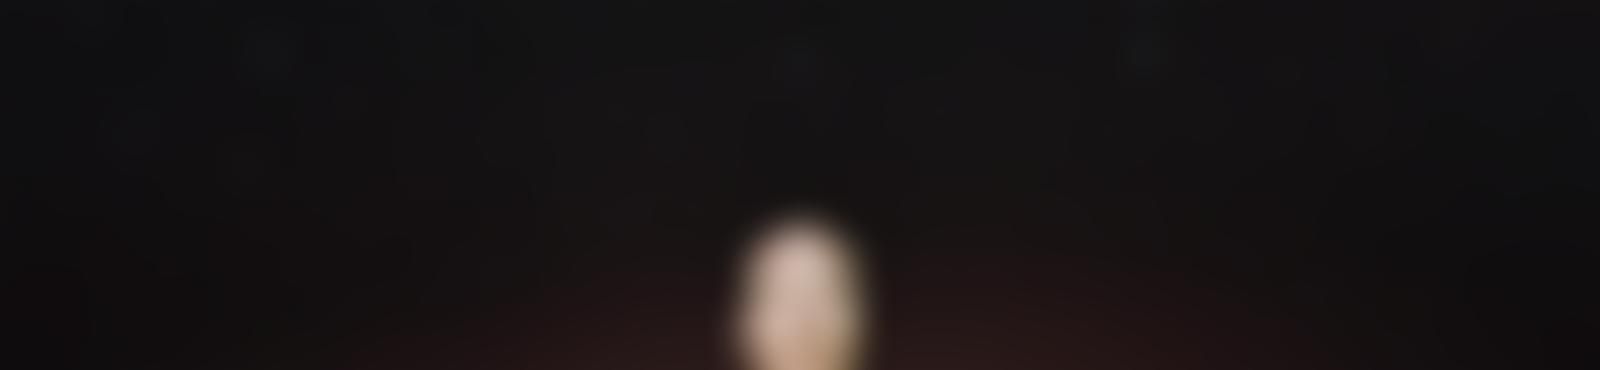 Blurred e75b6754 2405 4148 912a c332330f808f